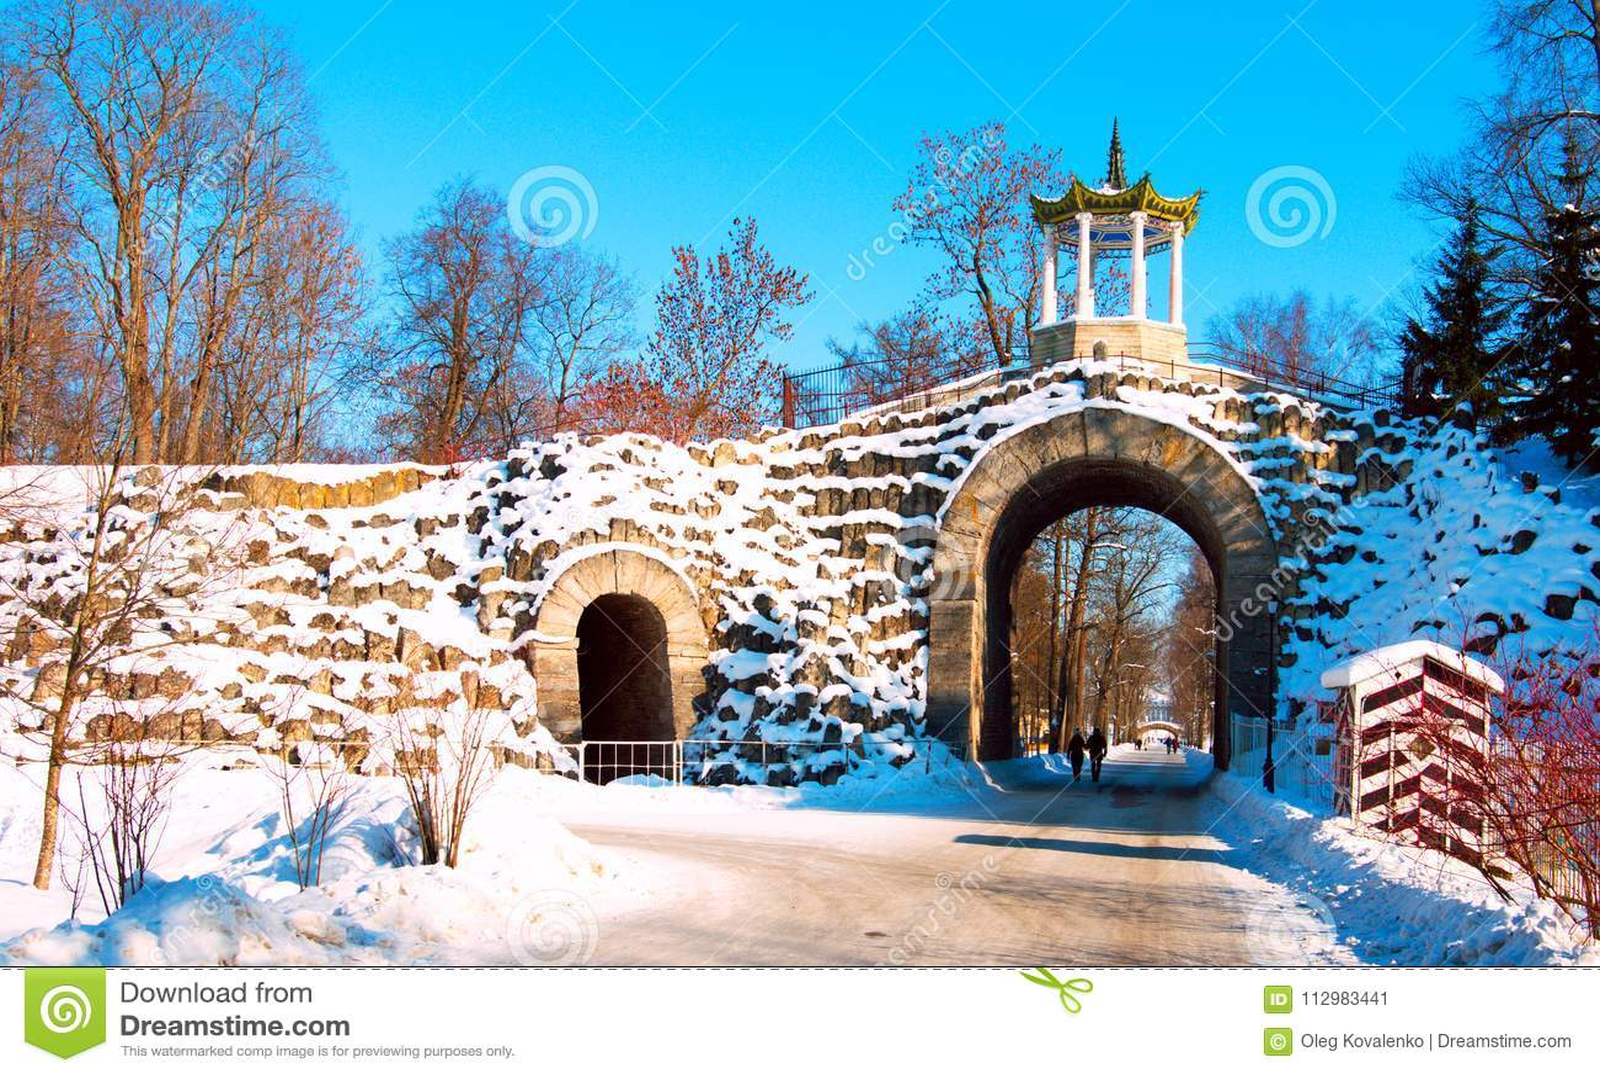 The stone labyrinth